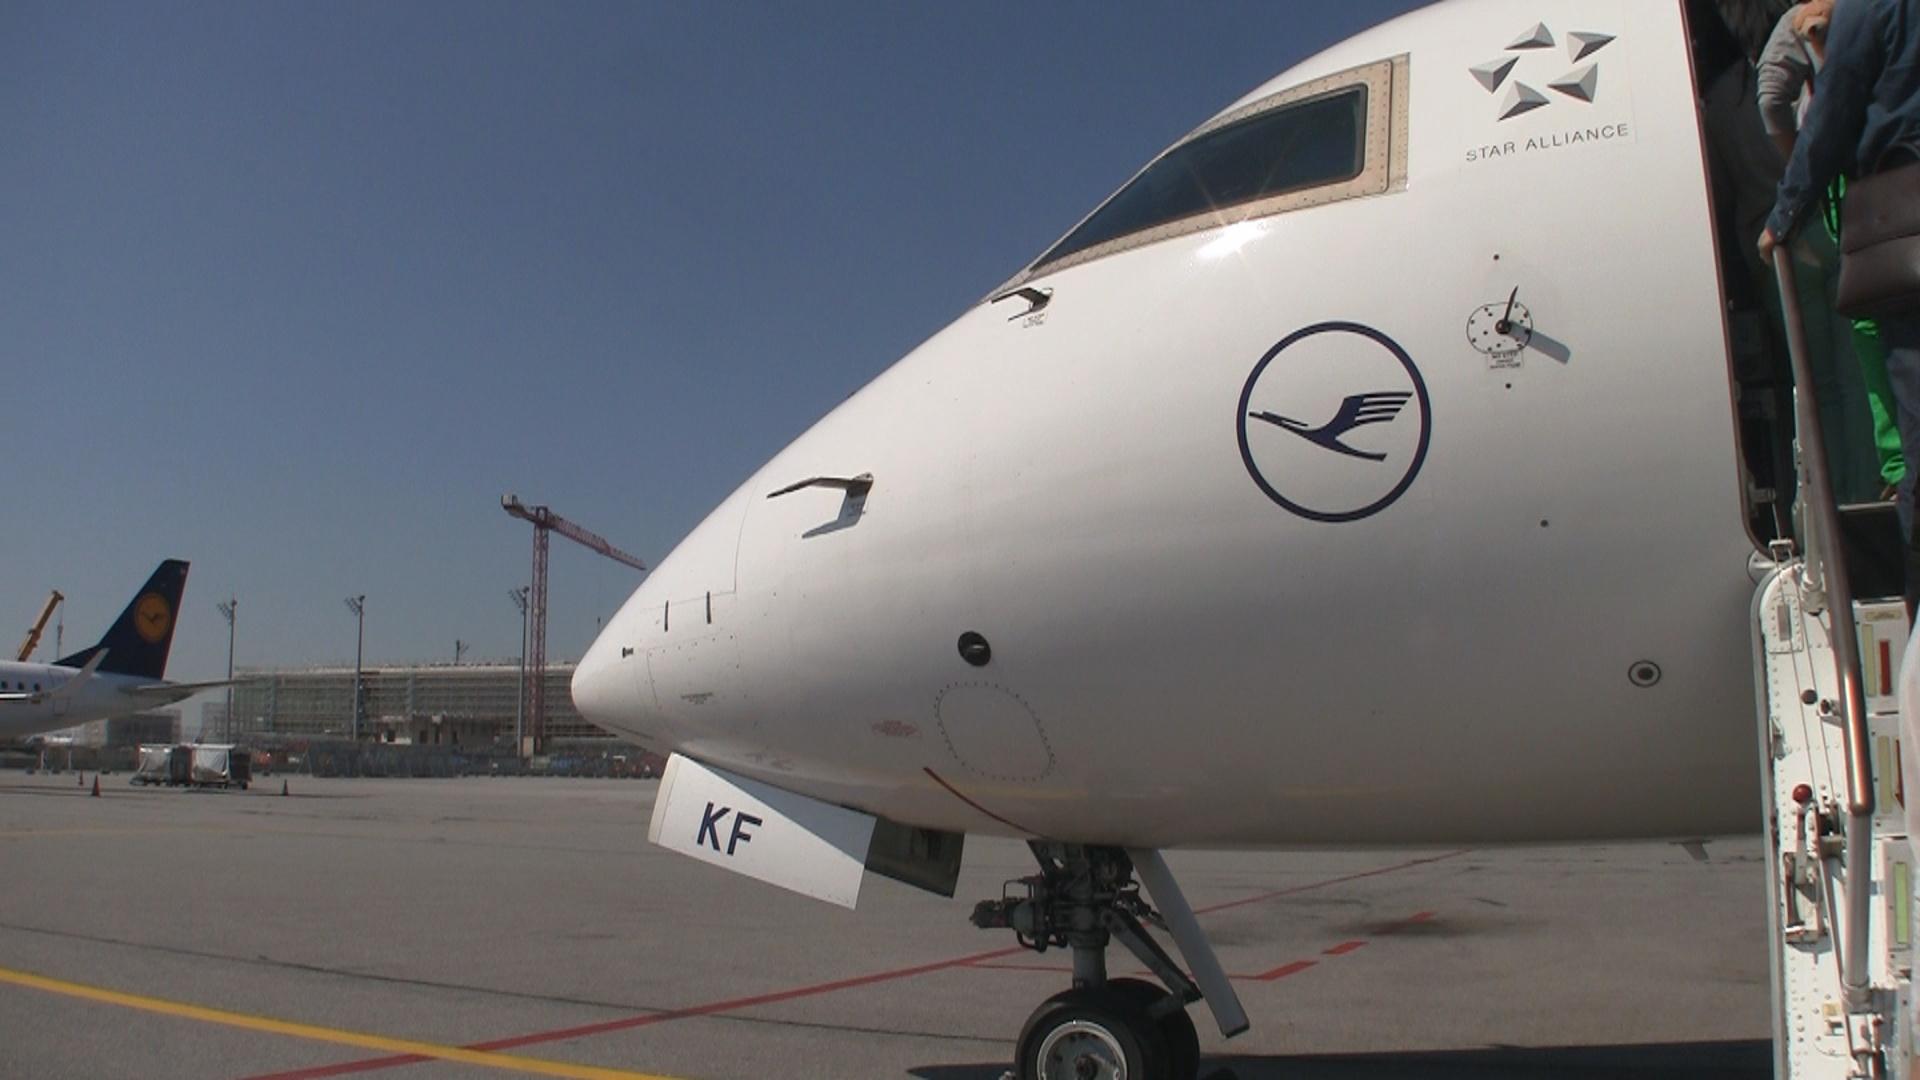 Video Lufthansa Cityline Business Class Crj 900 2f